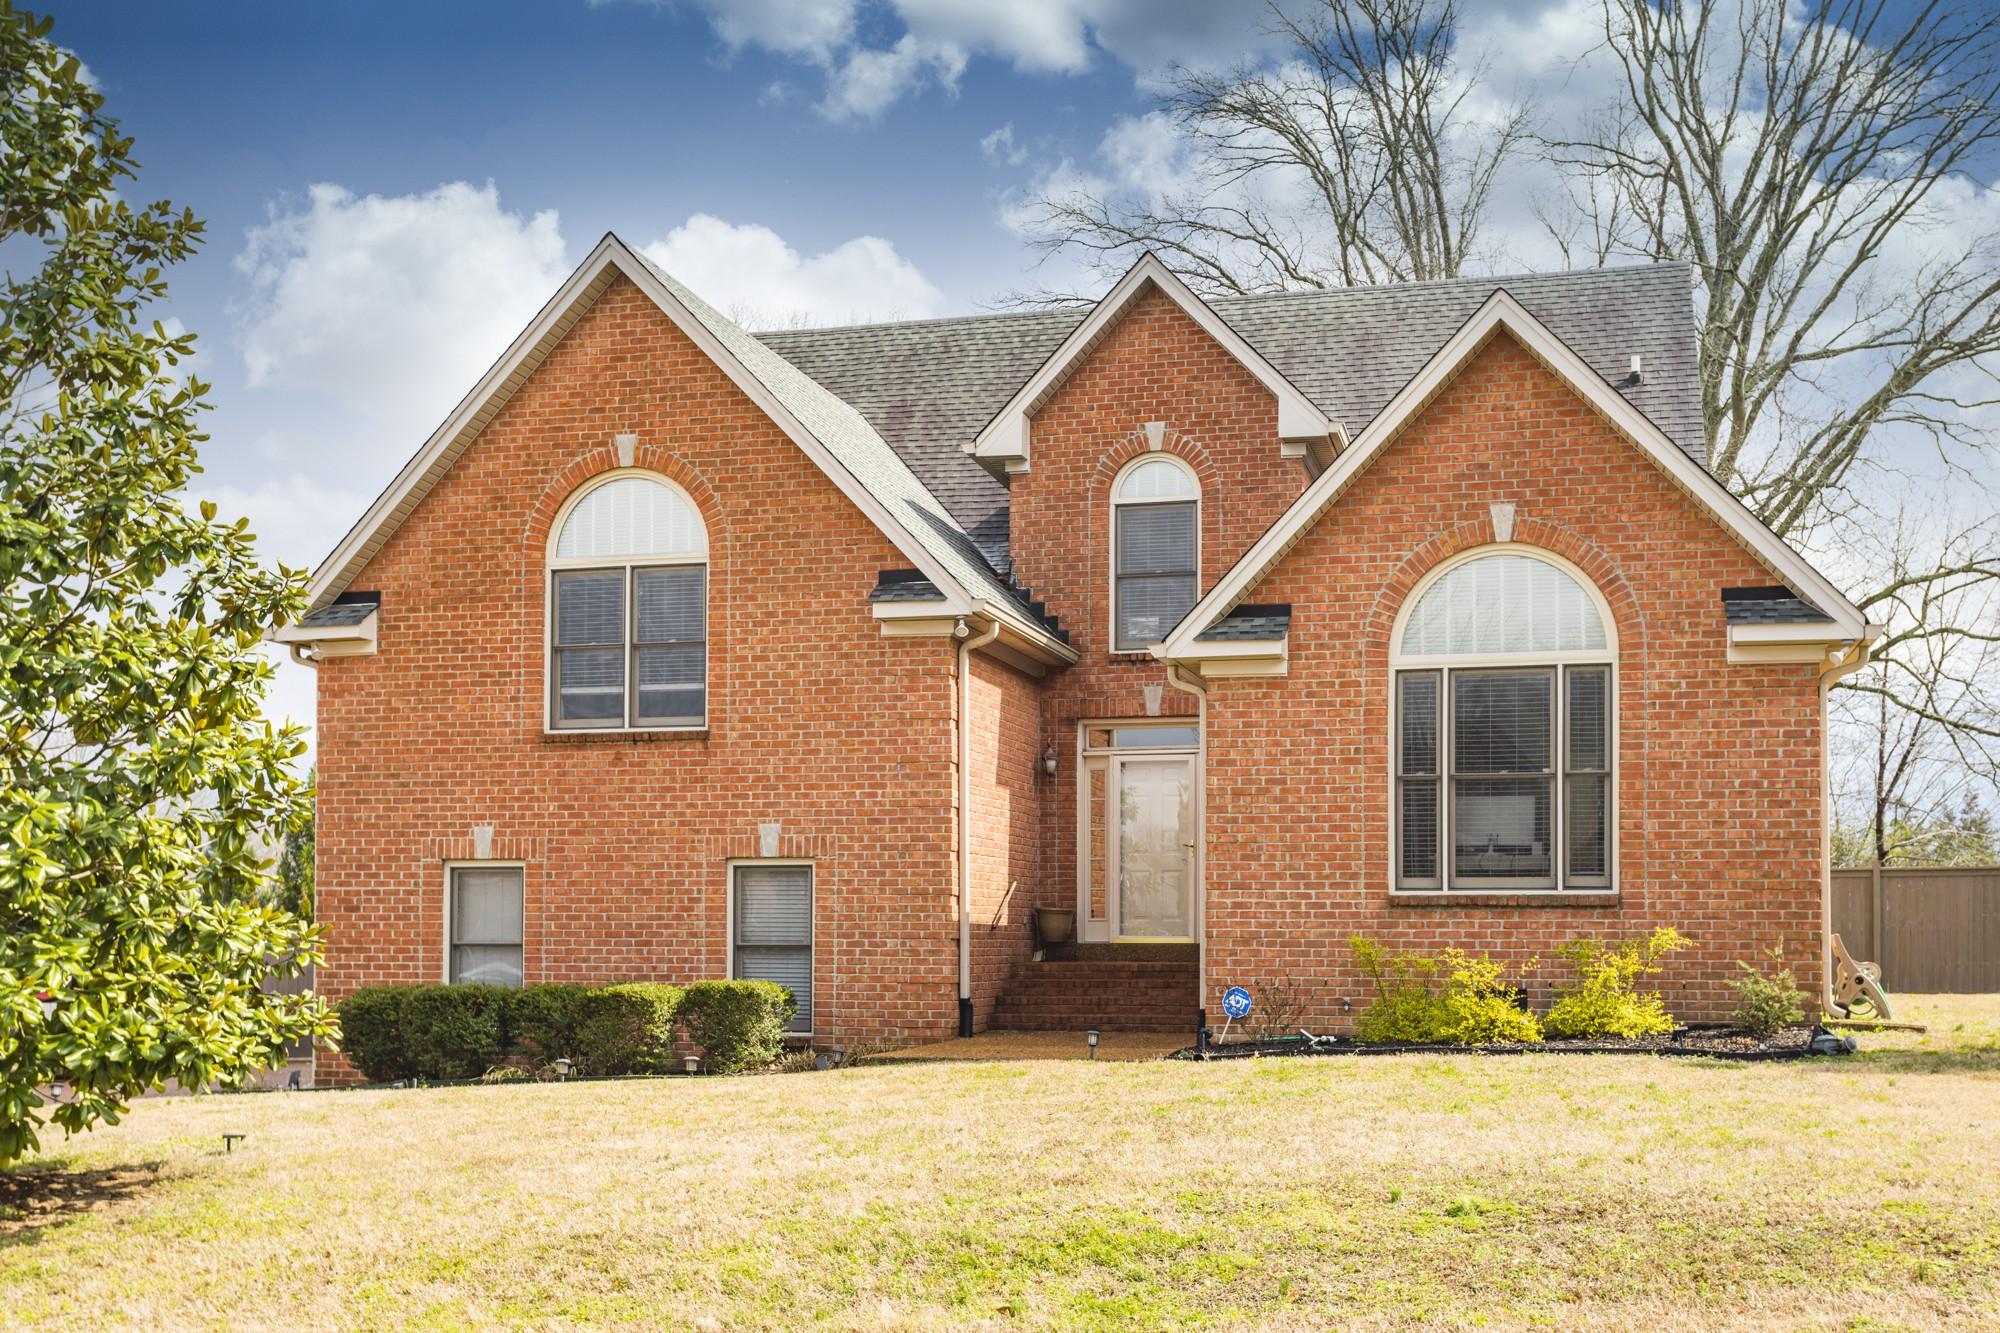 1317 Fishers Meadows Cv, Hermitage, TN 37076 - Hermitage, TN real estate listing